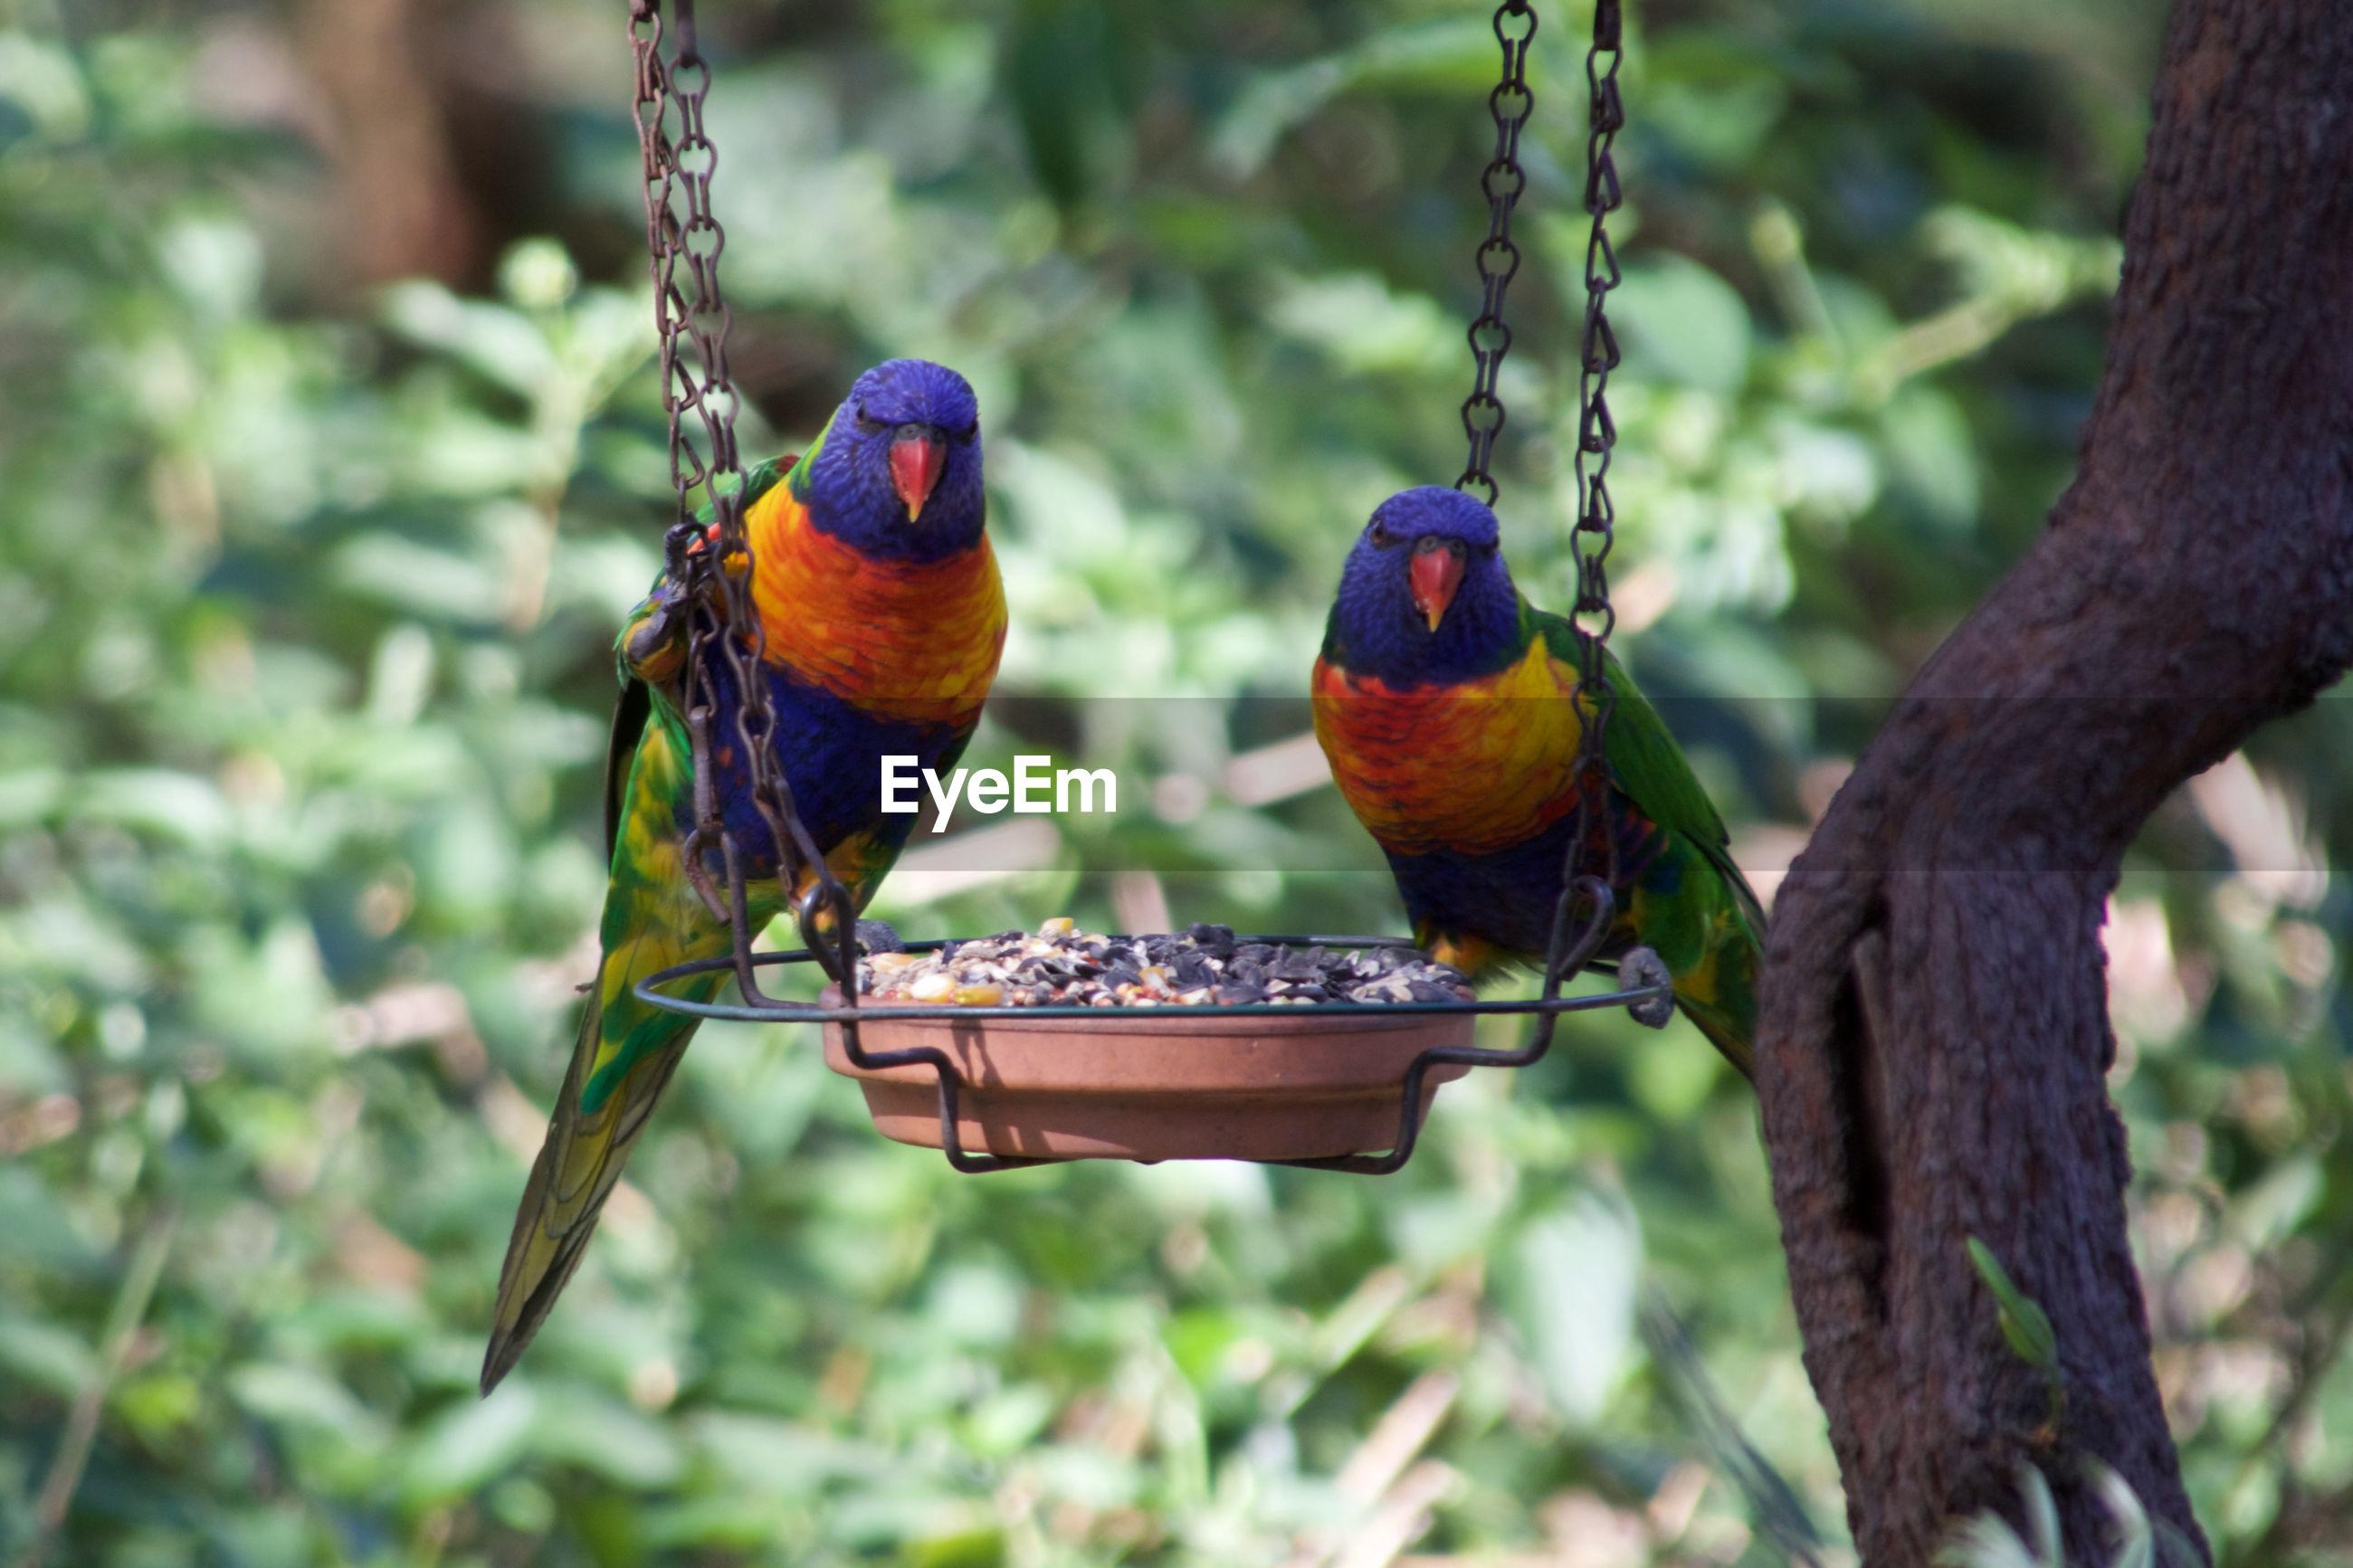 Rainbow lorikeets perching on feeder